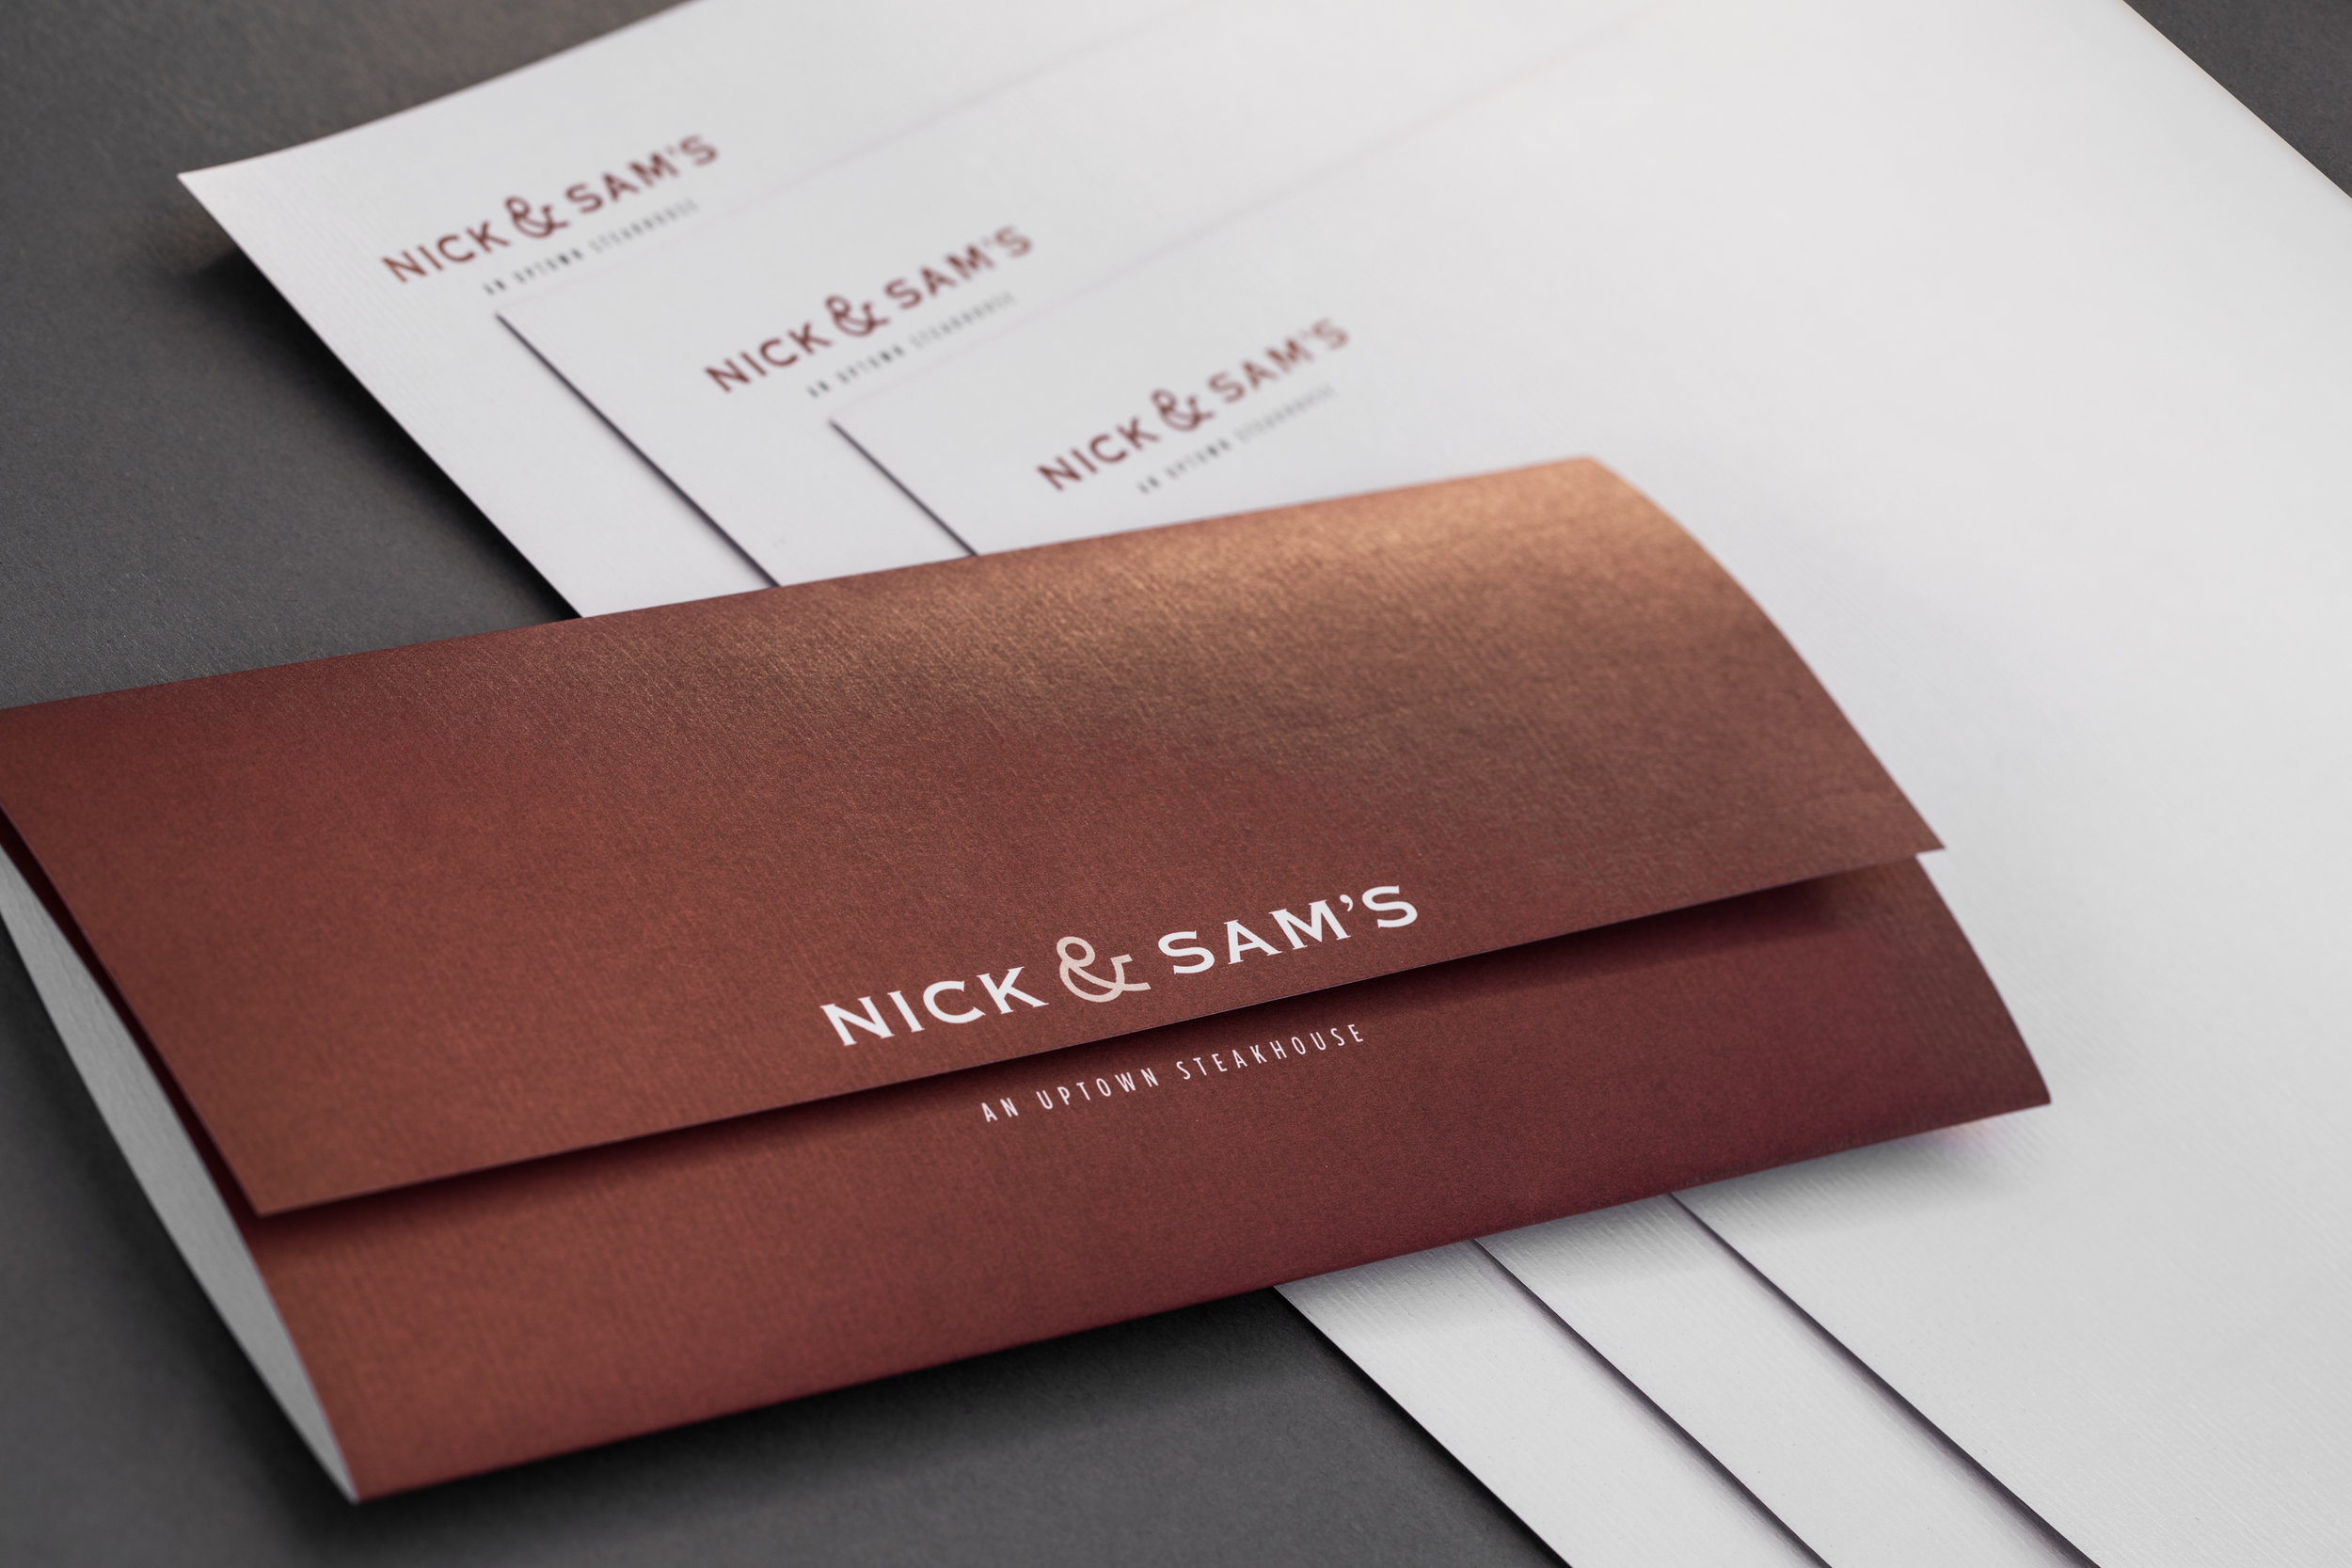 Nick_&_Sam's_Stationary-3.jpg